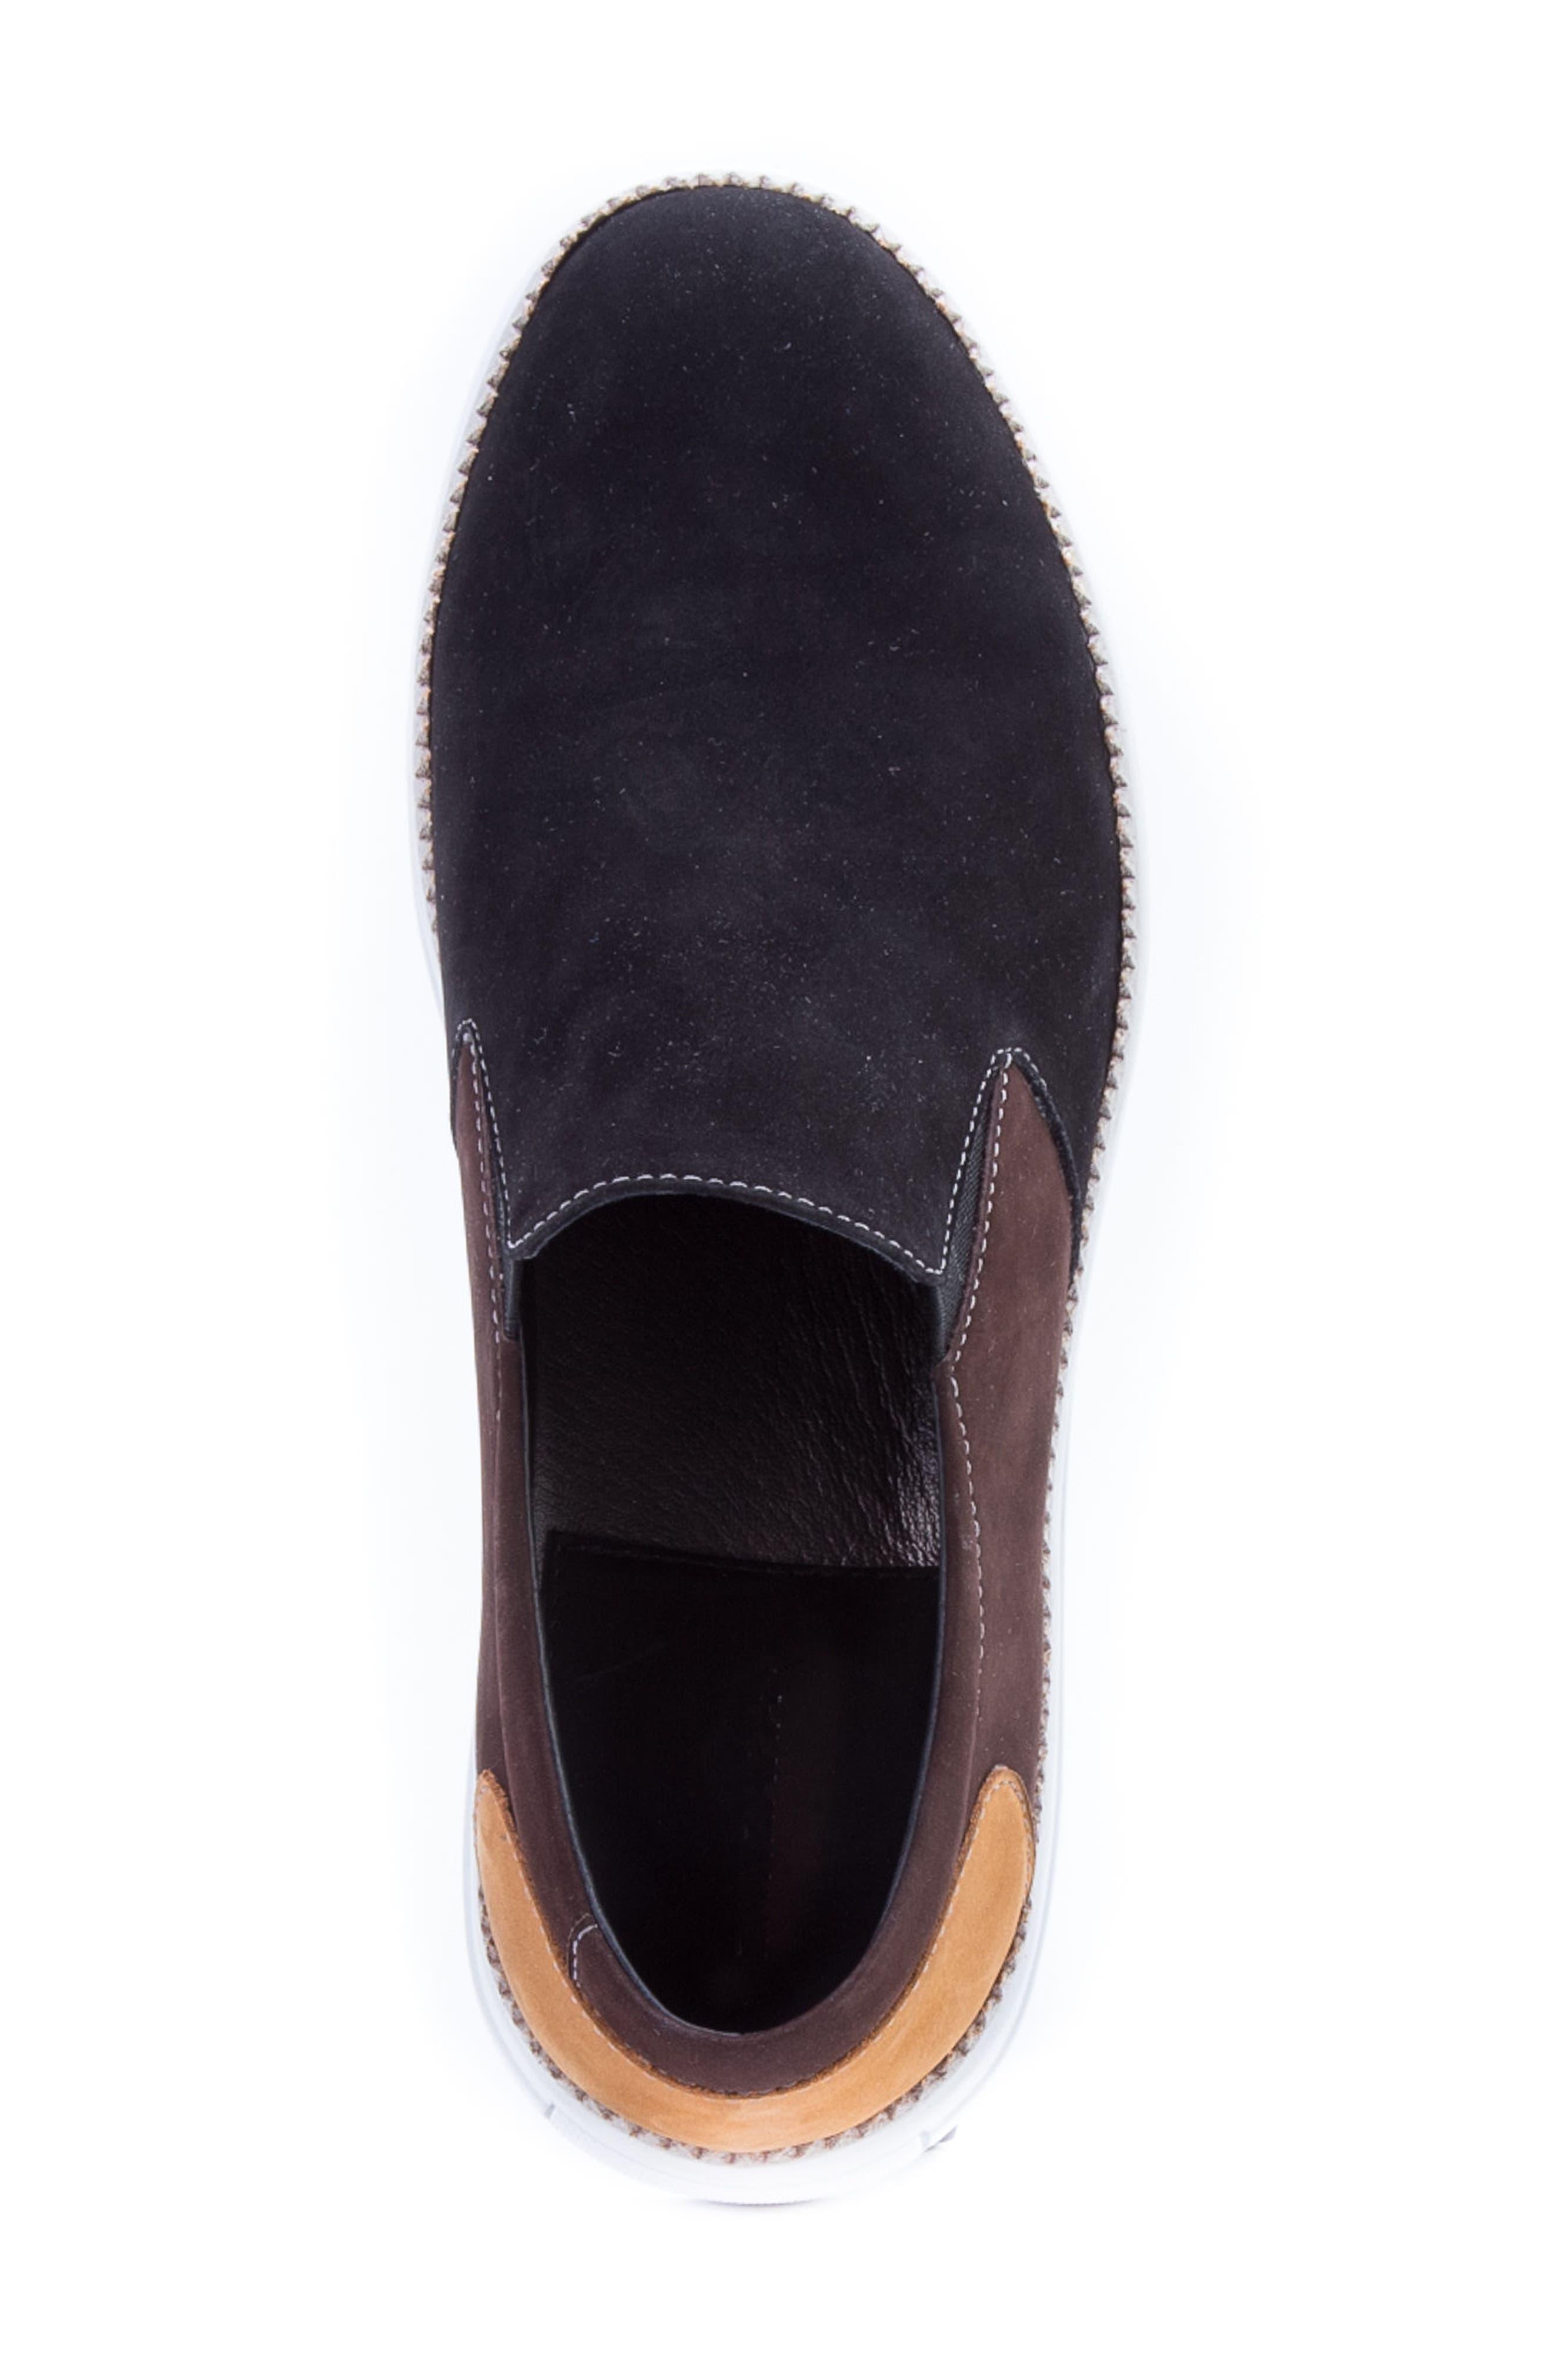 ZANZARA,                             Rivera Colorblocked Slip-On Sneaker,                             Alternate thumbnail 5, color,                             001